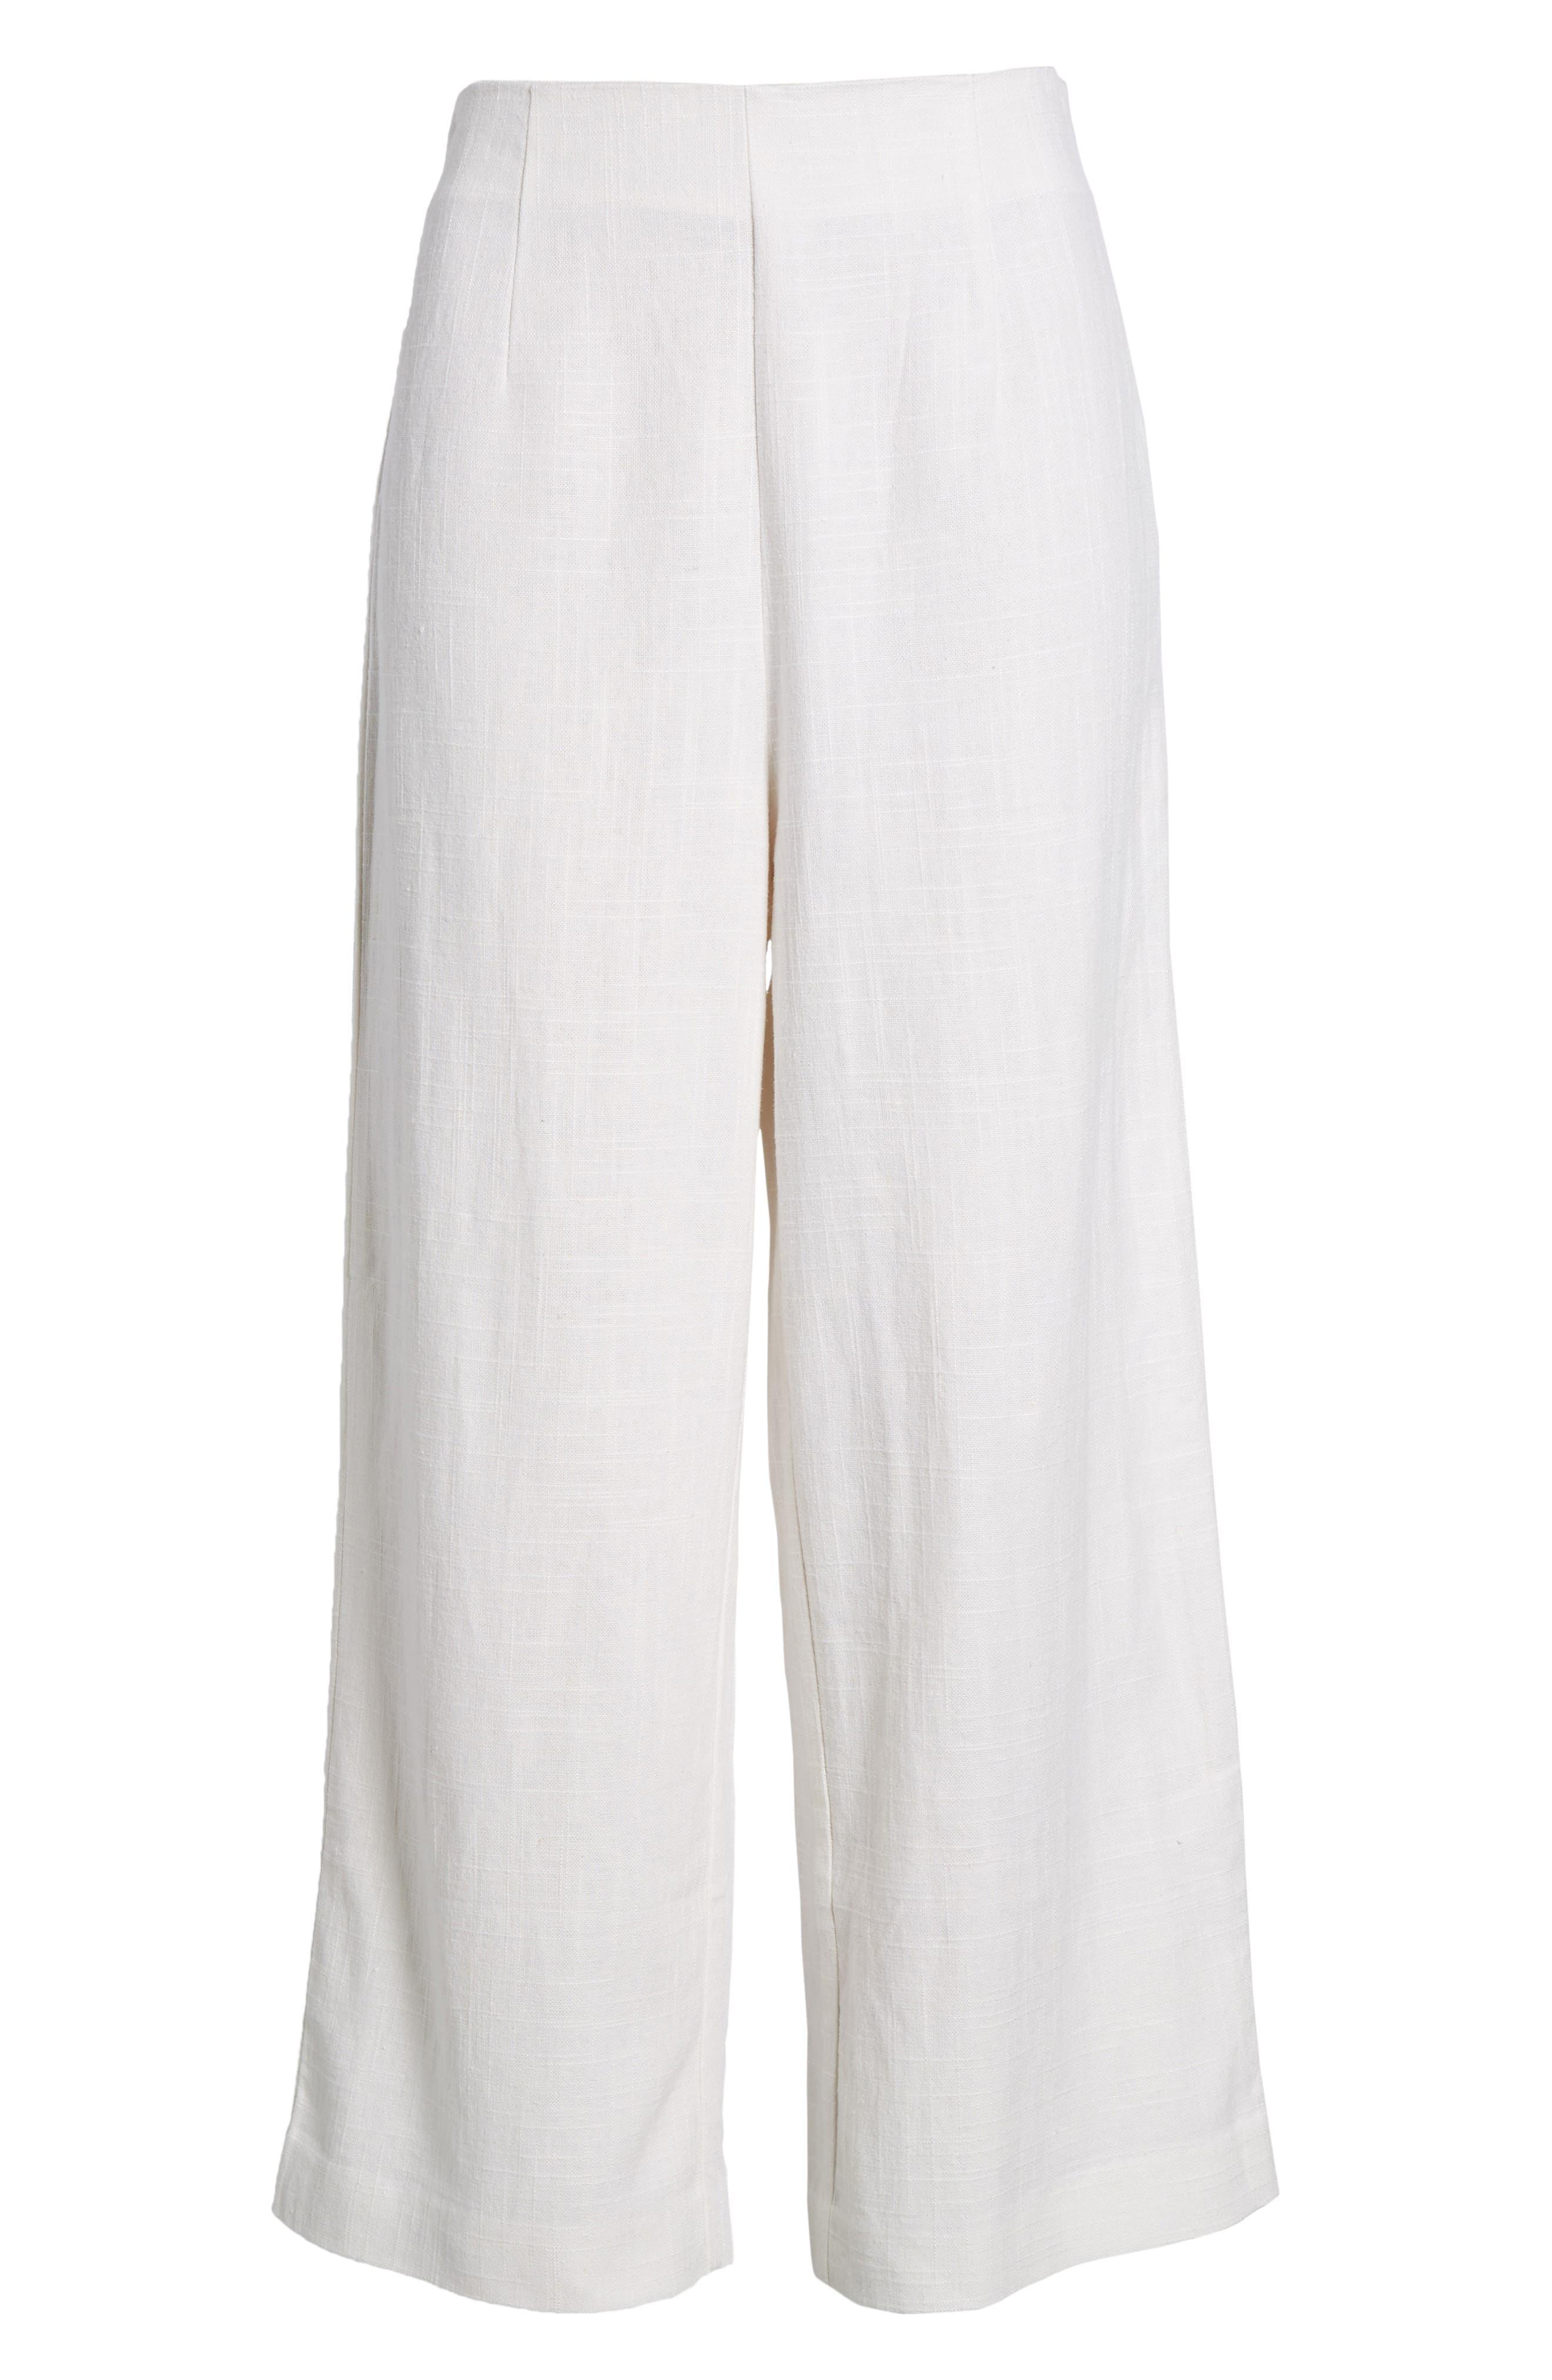 Linen High Waist Crop Pants,                             Alternate thumbnail 8, color,                             White